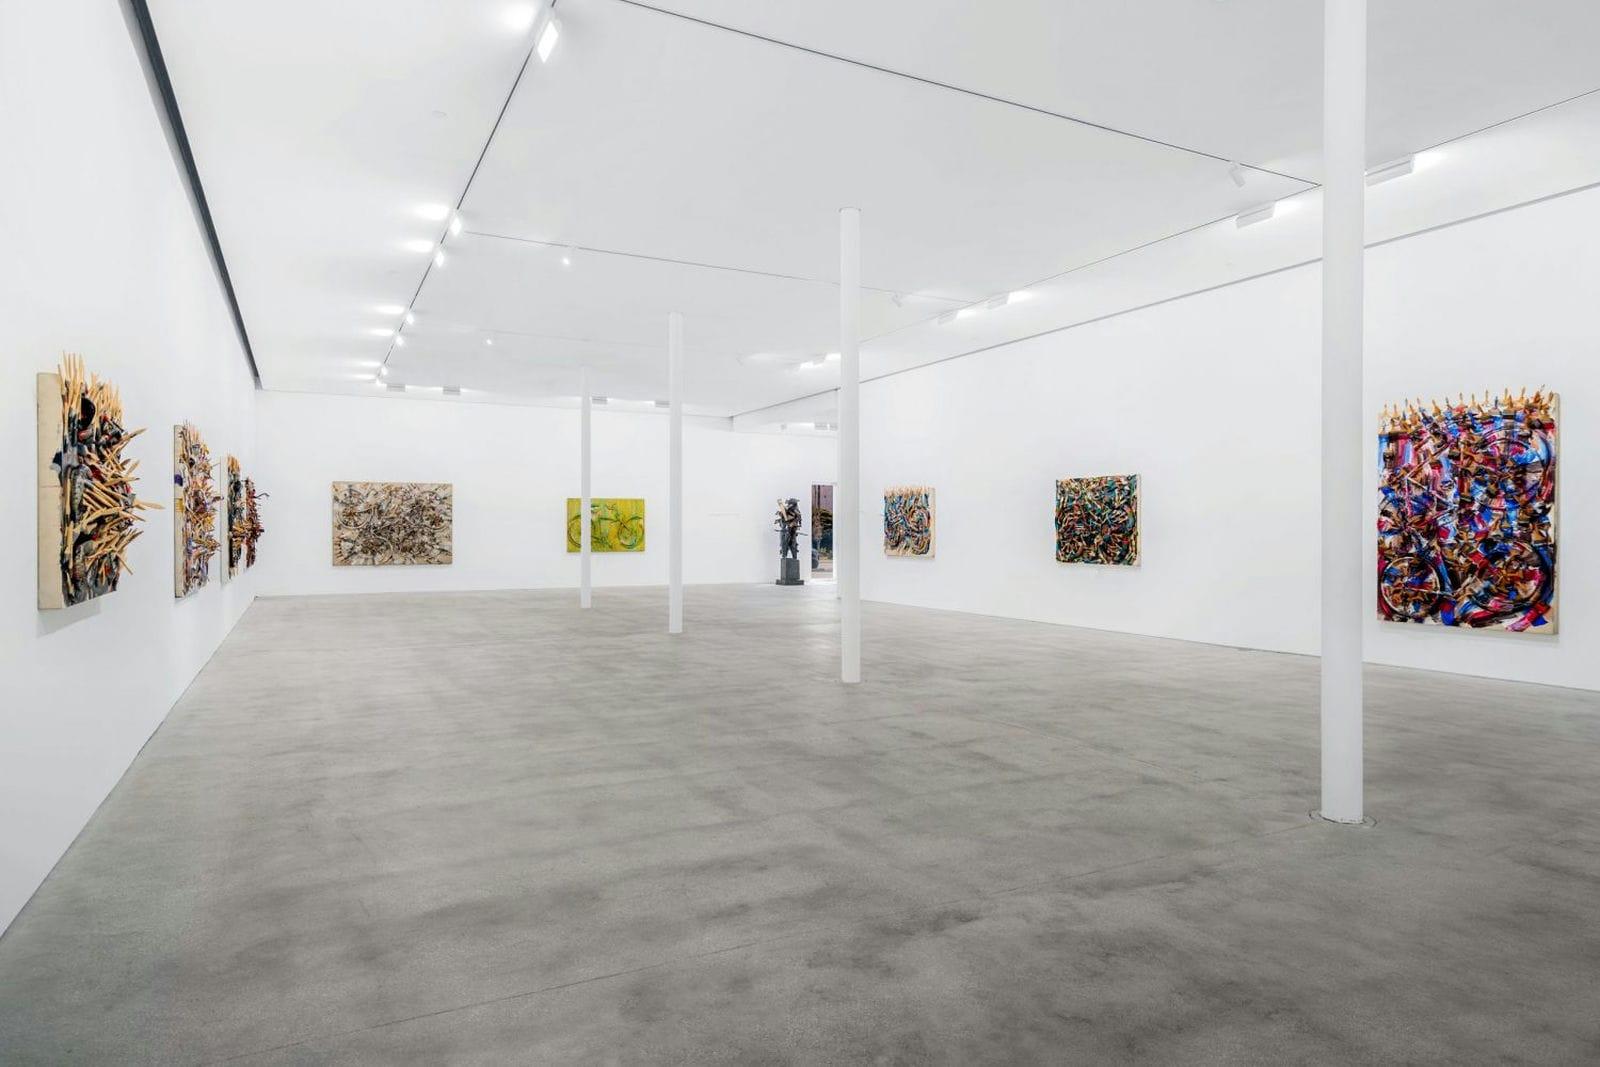 Main Gallery. 3